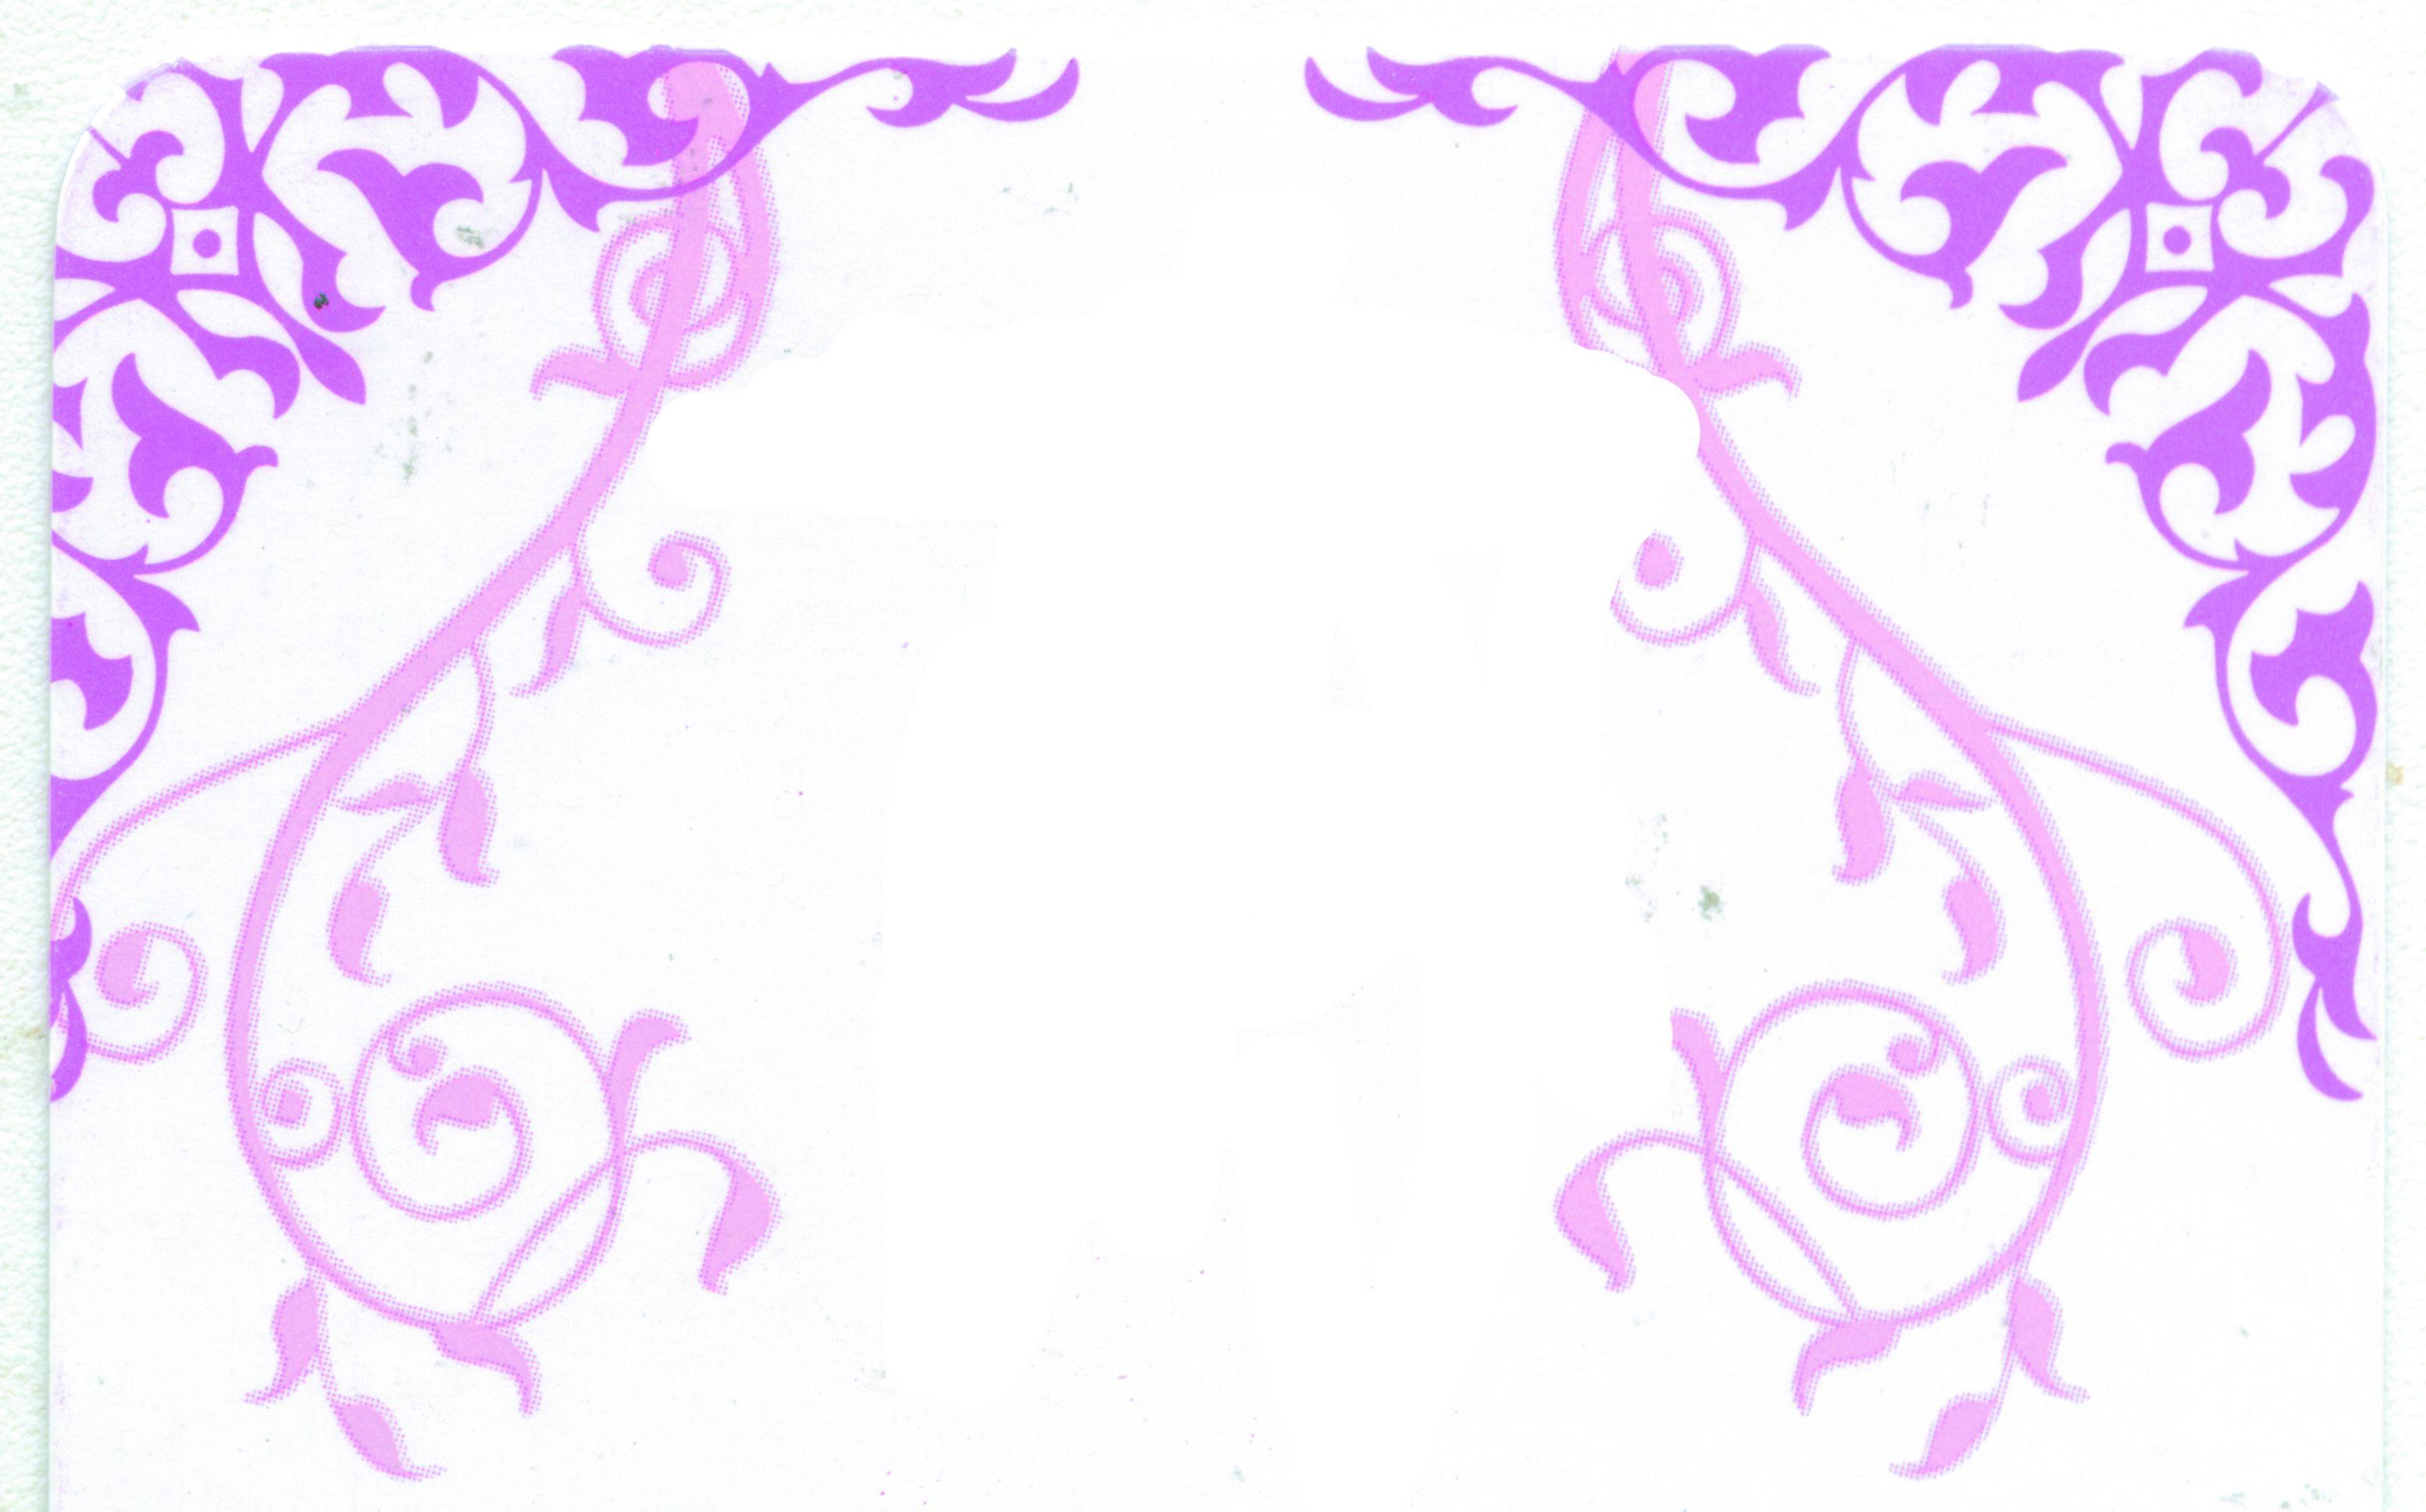 ppt 背景 背景图片 边框 模板 设计 矢量 矢量图 素材 相框 3106_1936